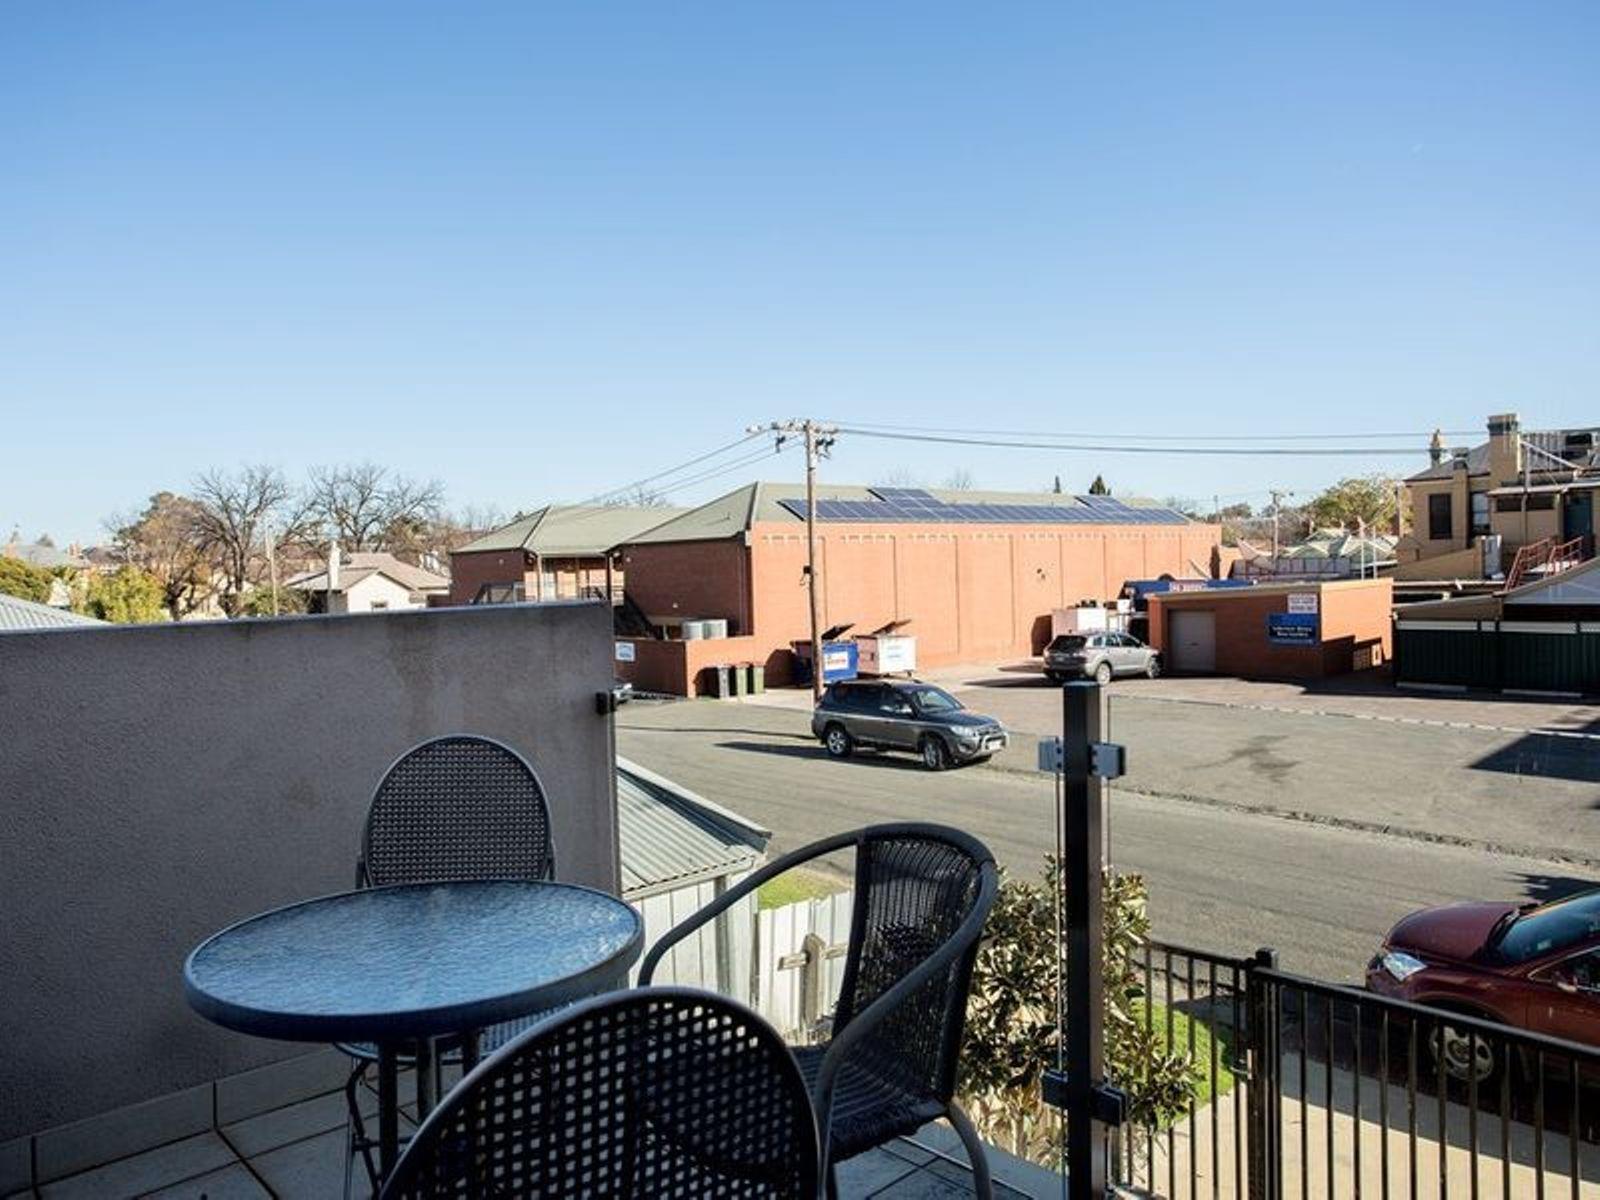 9B Holt Street, Bendigo, VIC 3550